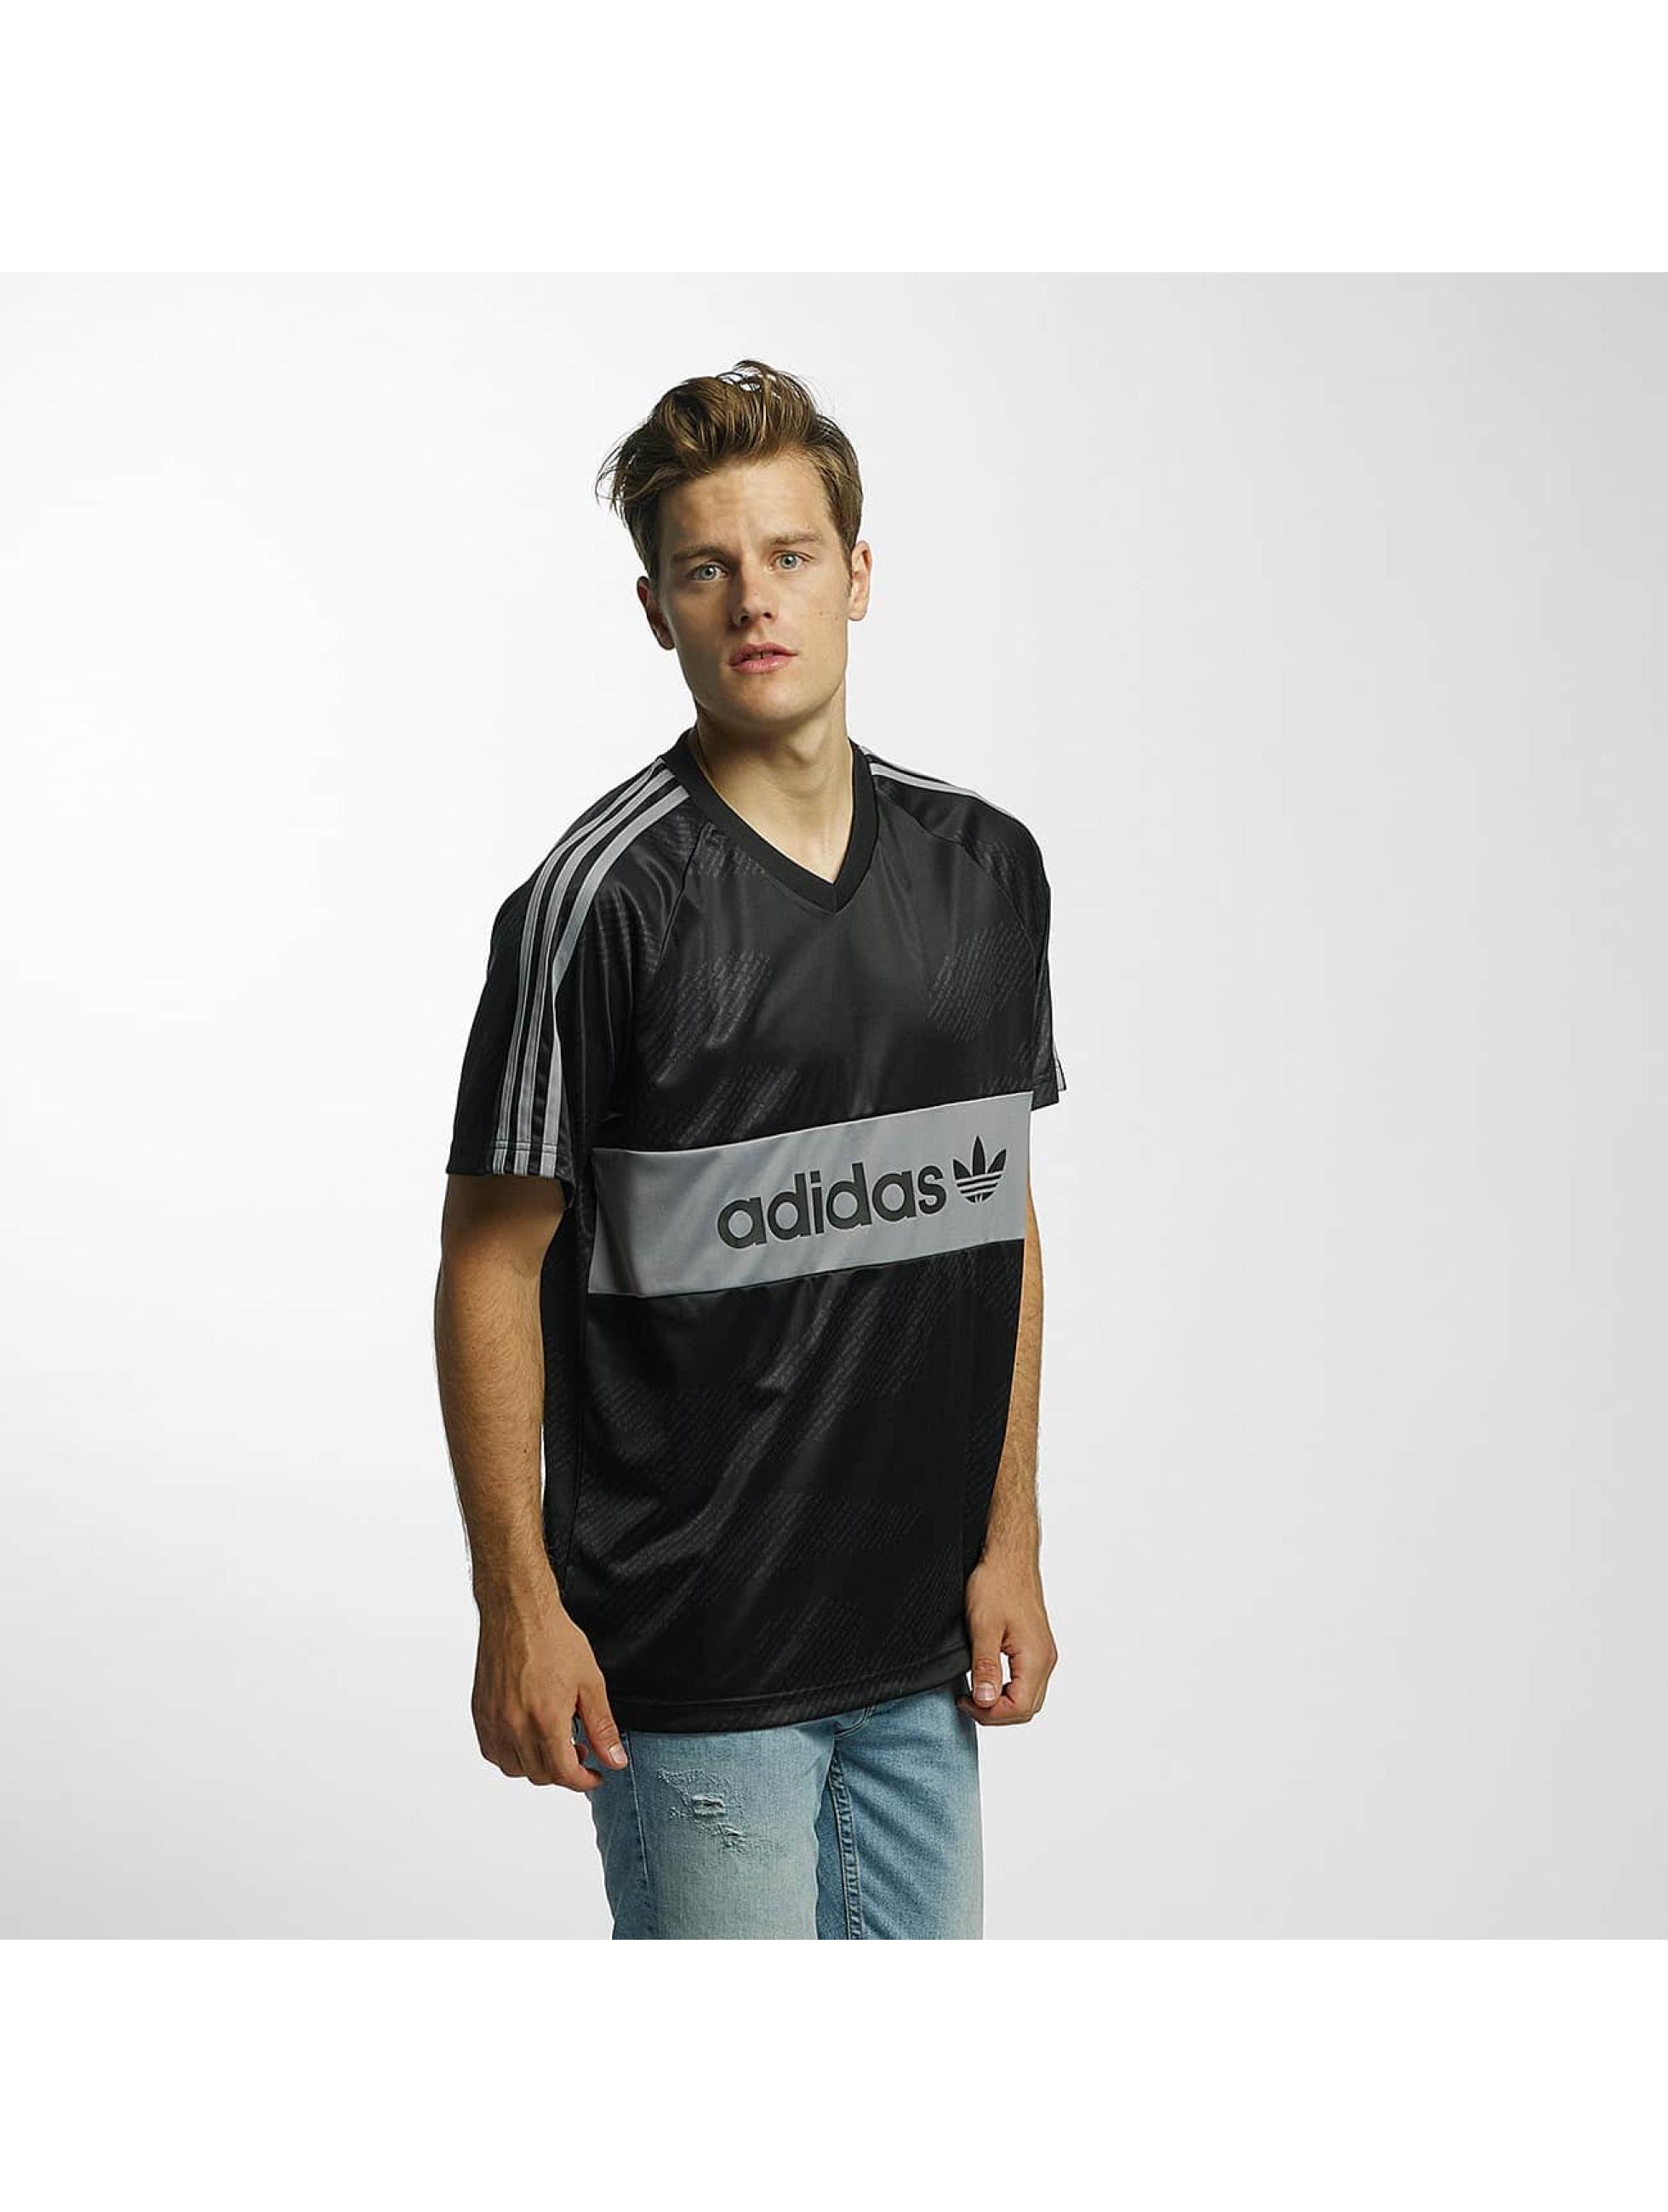 adidas Männer T-Shirt Jersey Word Camo in schwarz